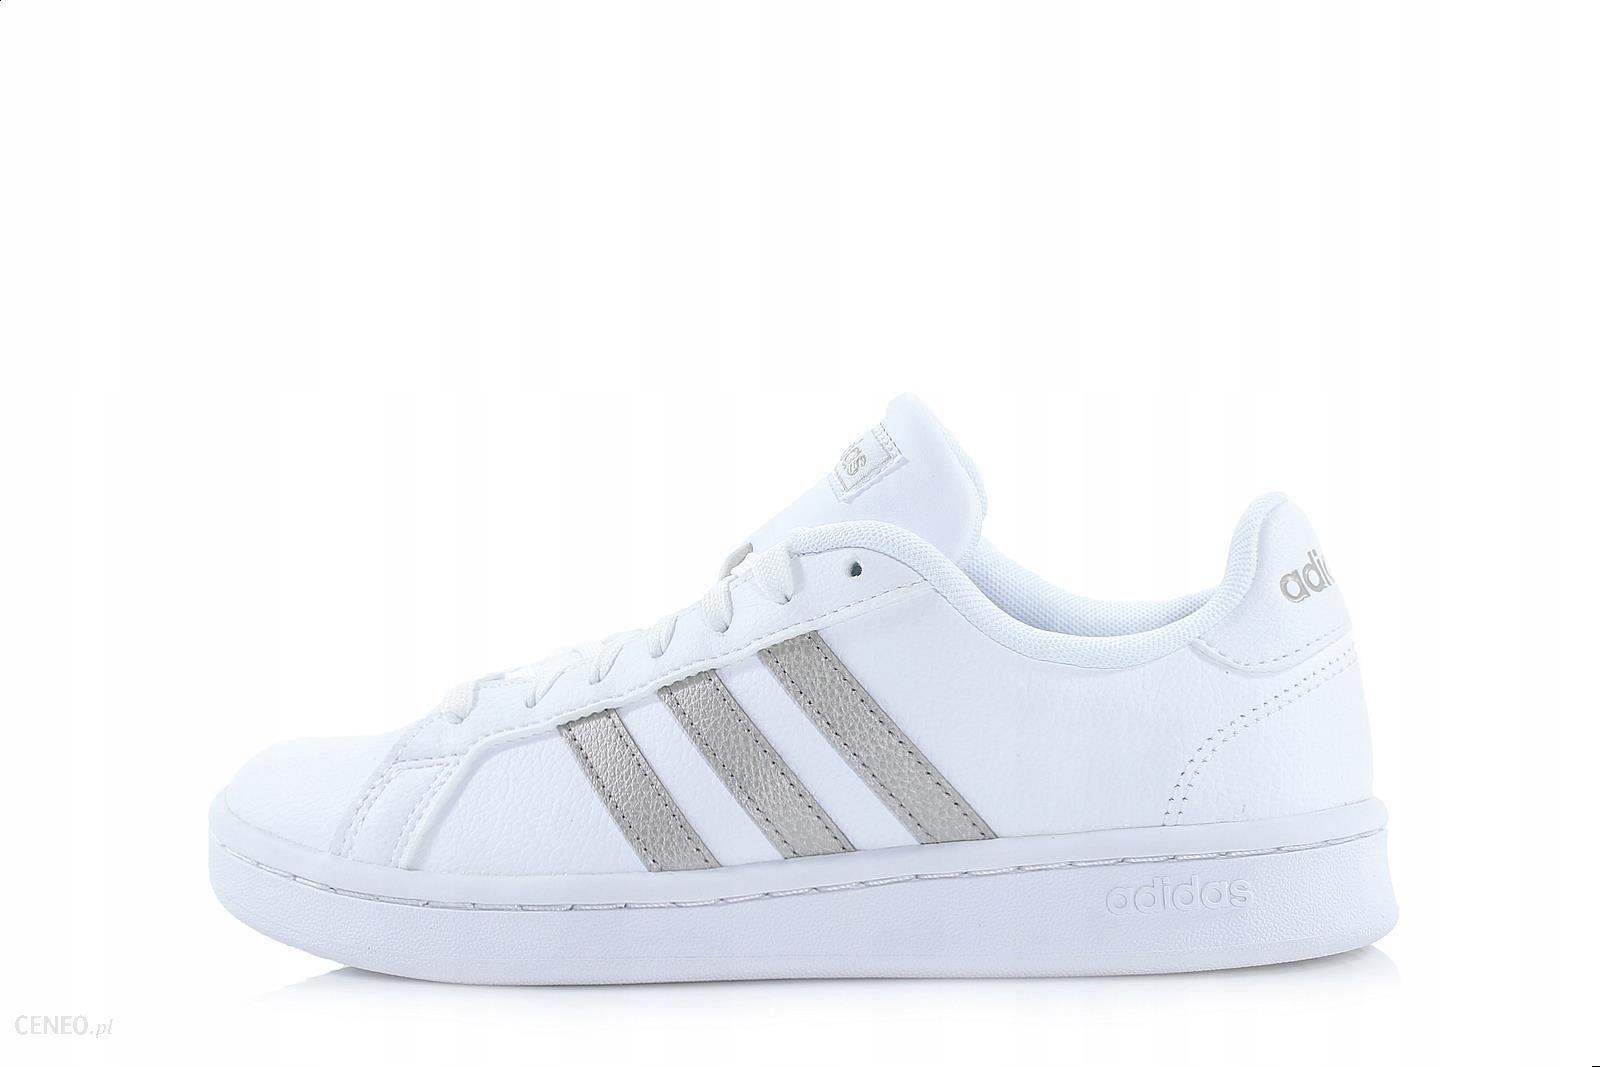 Buty damskie adidas Grand Court F36485